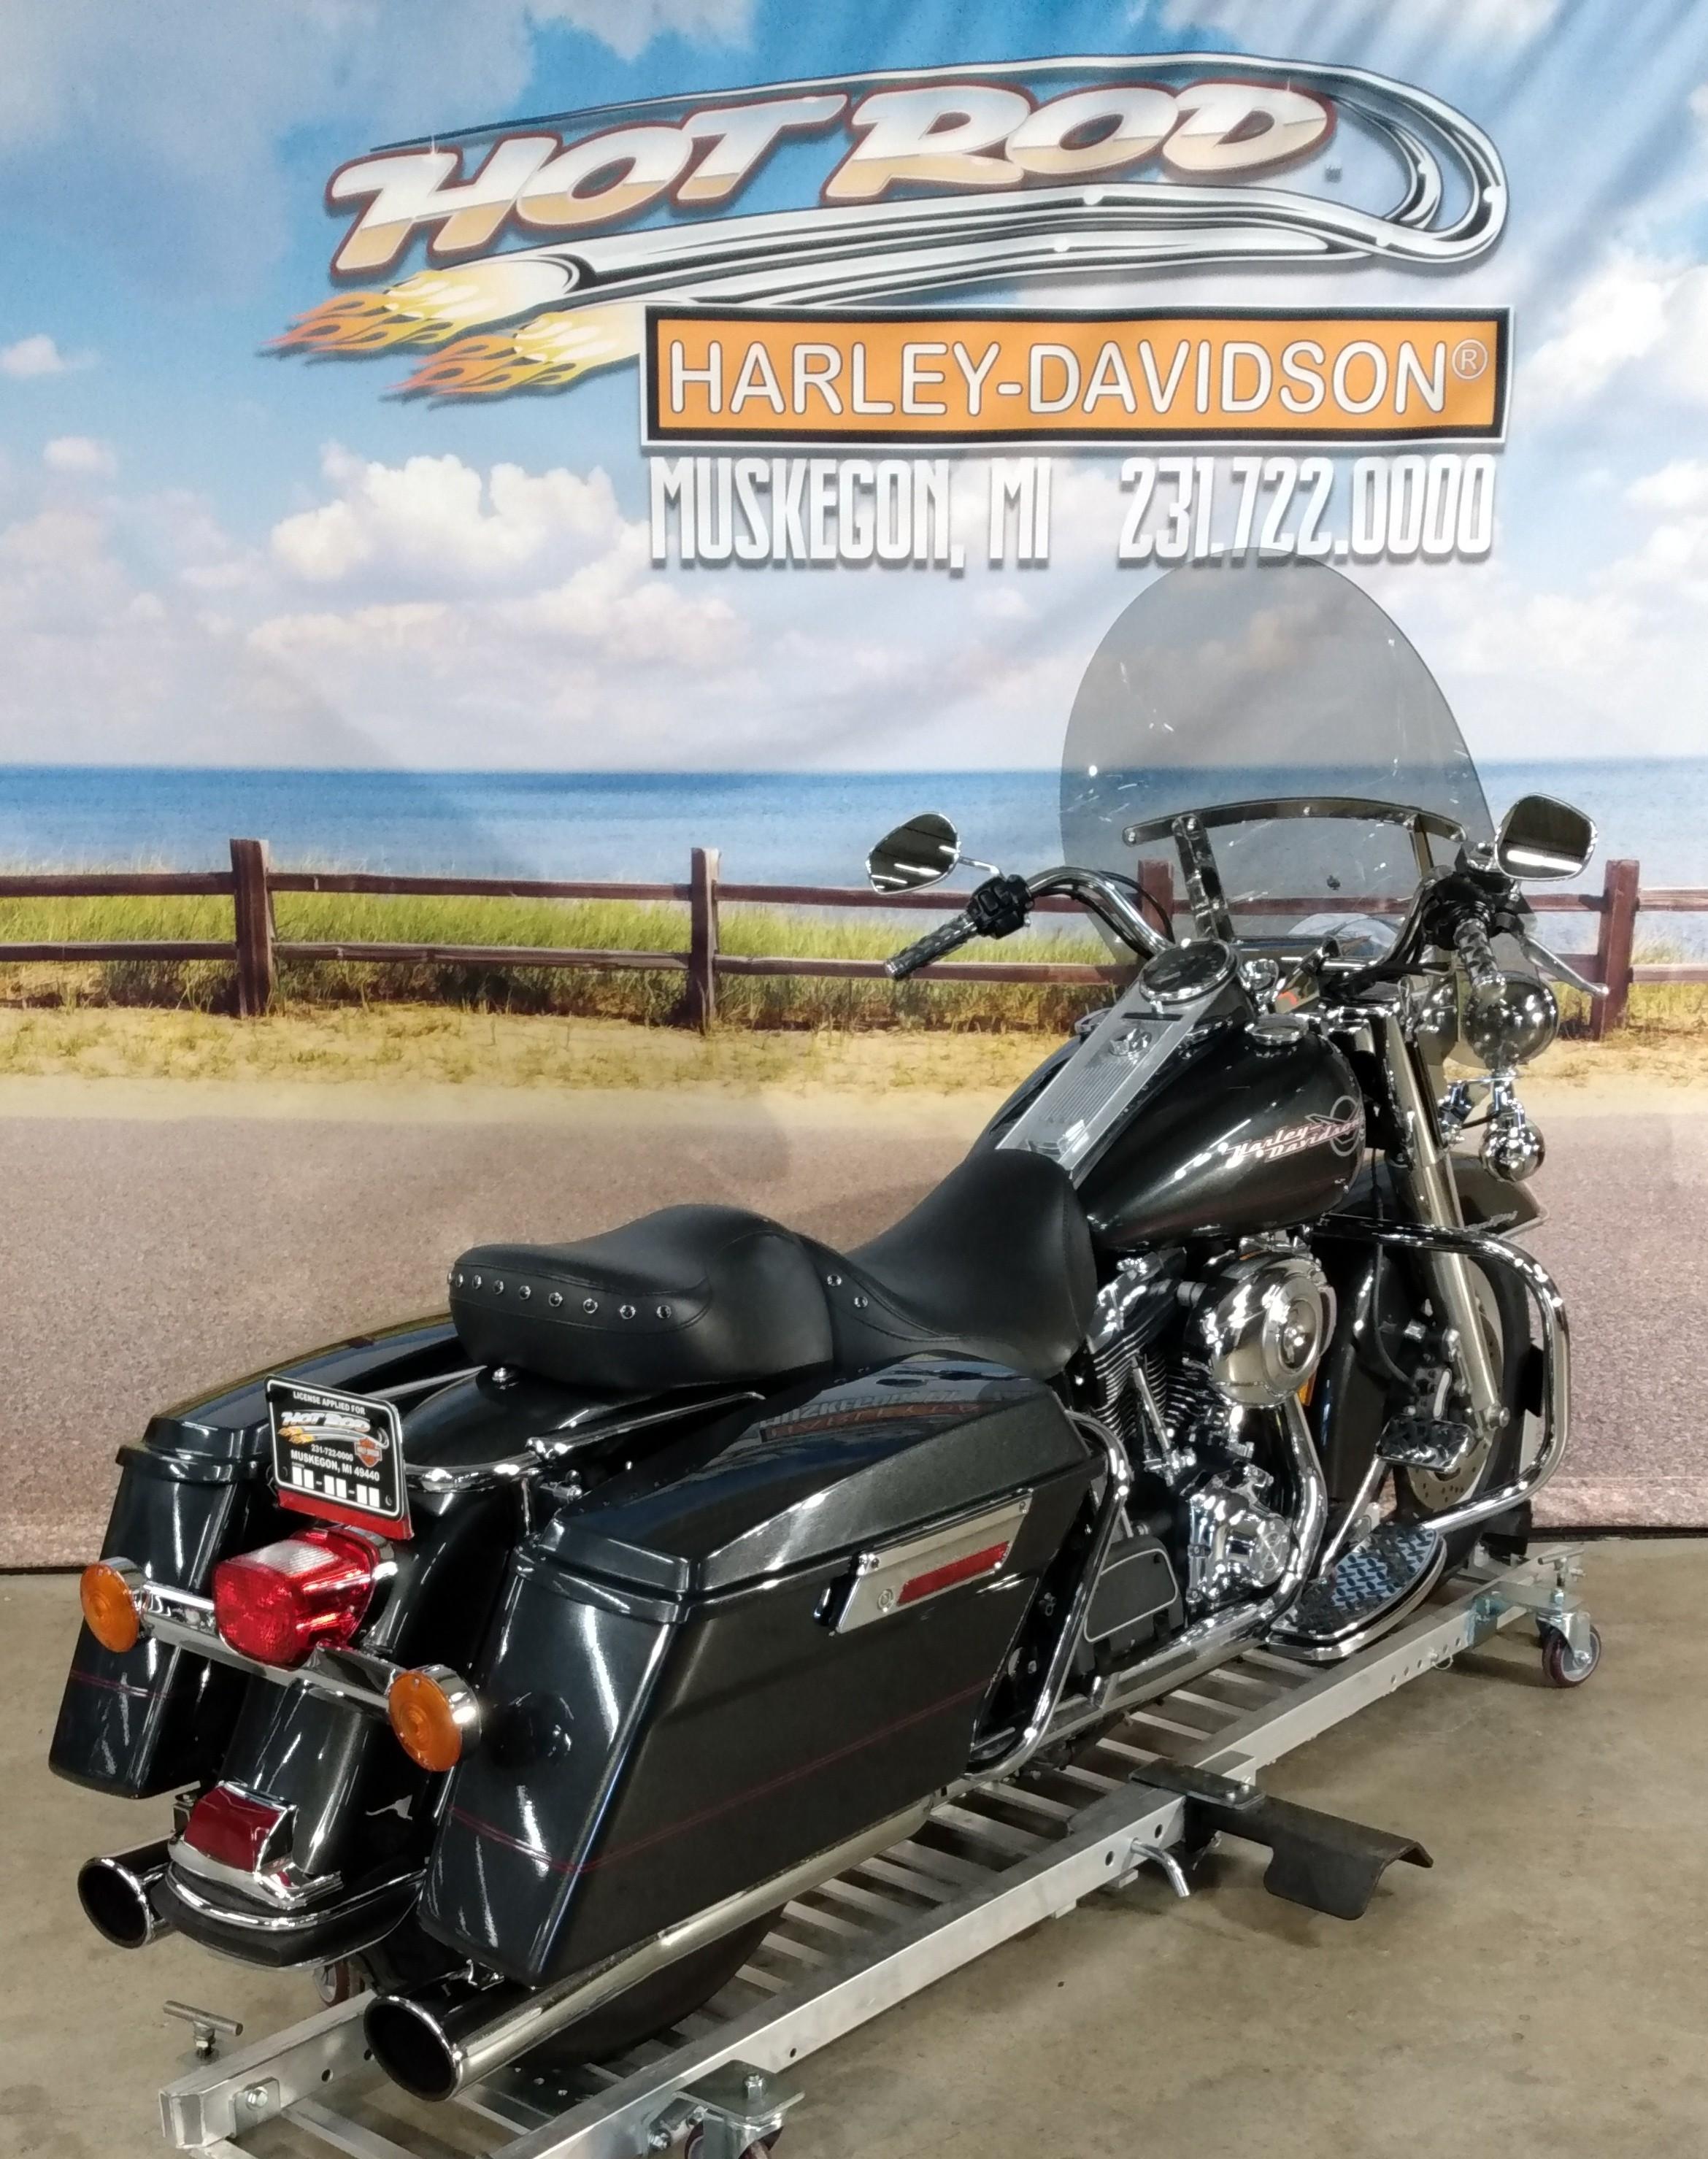 2007 Harley-Davidson Road King Base at Hot Rod Harley-Davidson